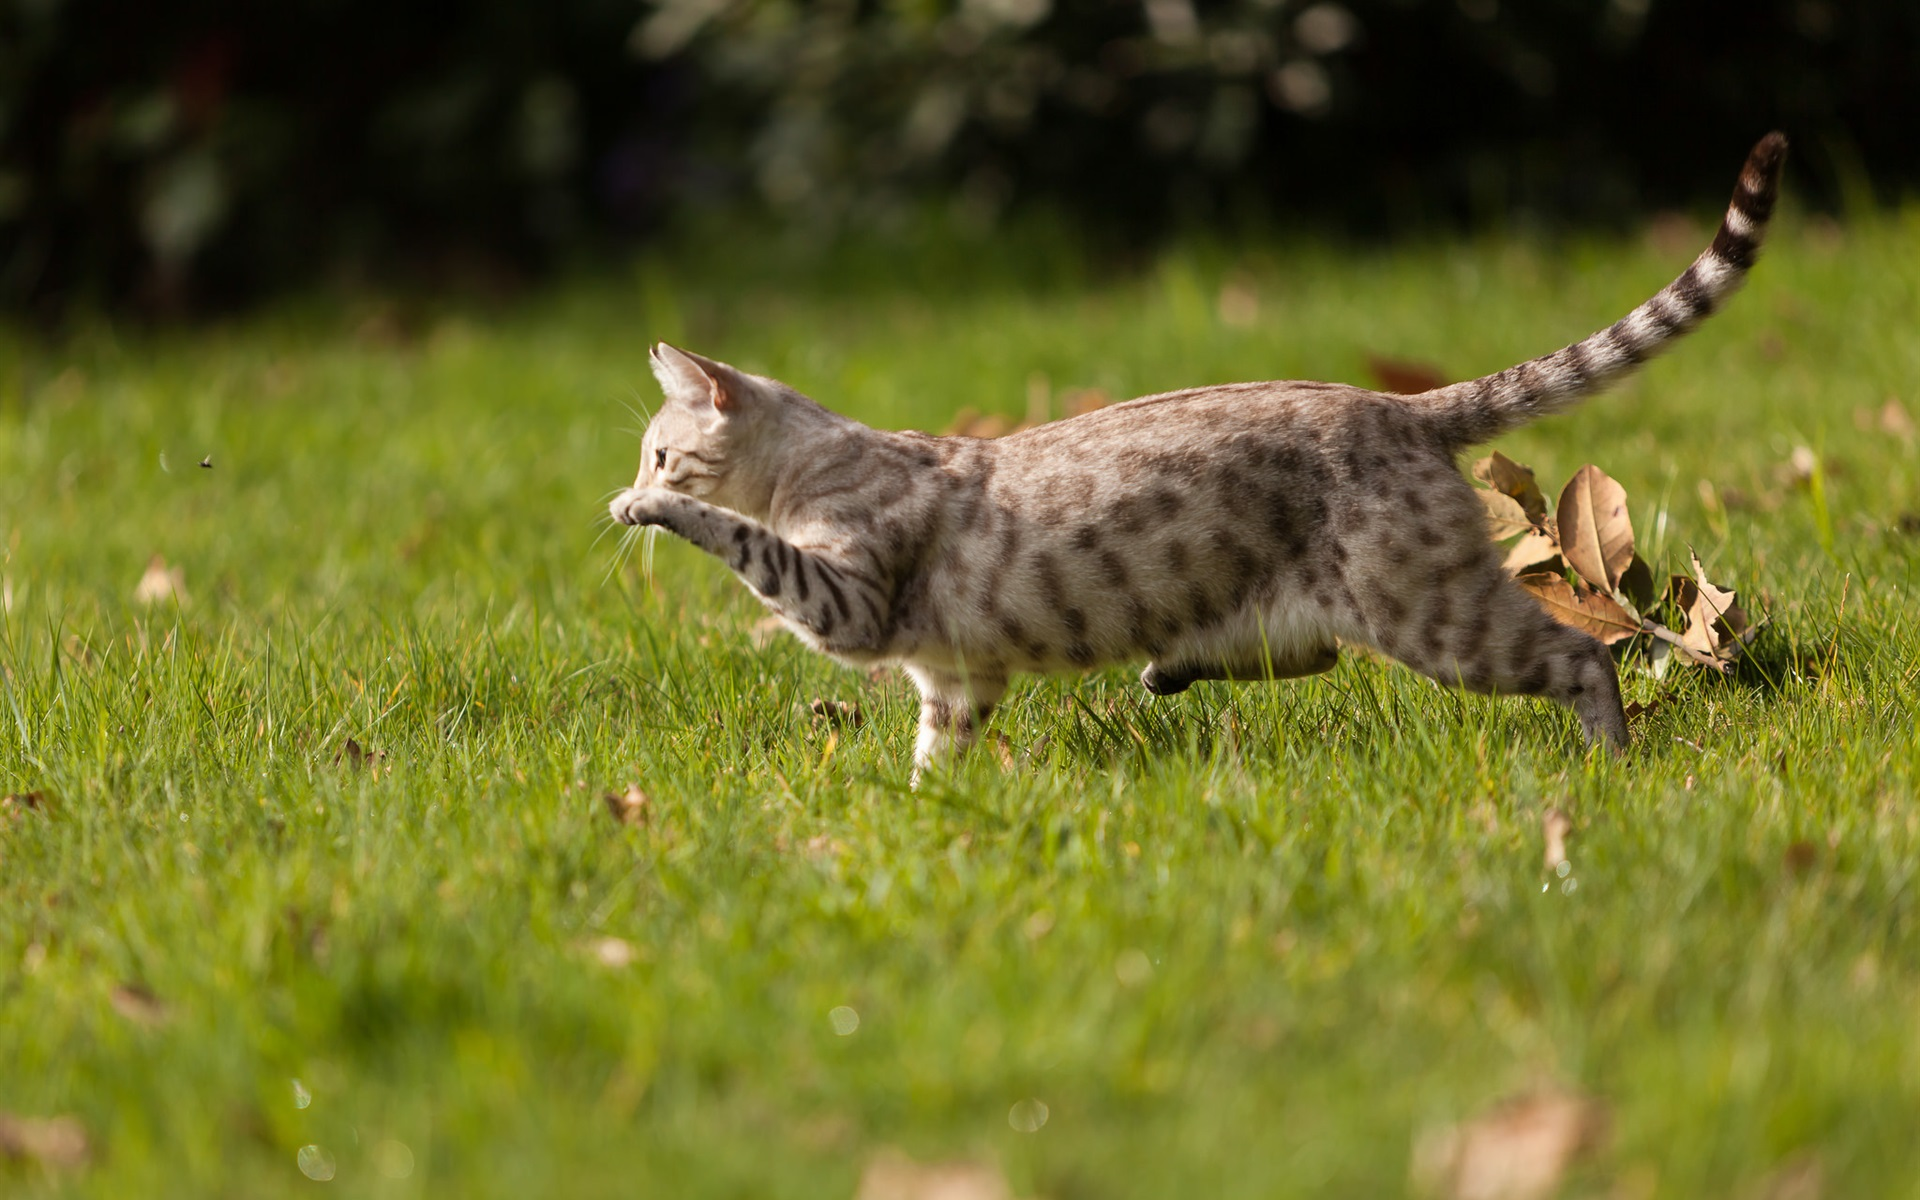 Картинка кота который бежит